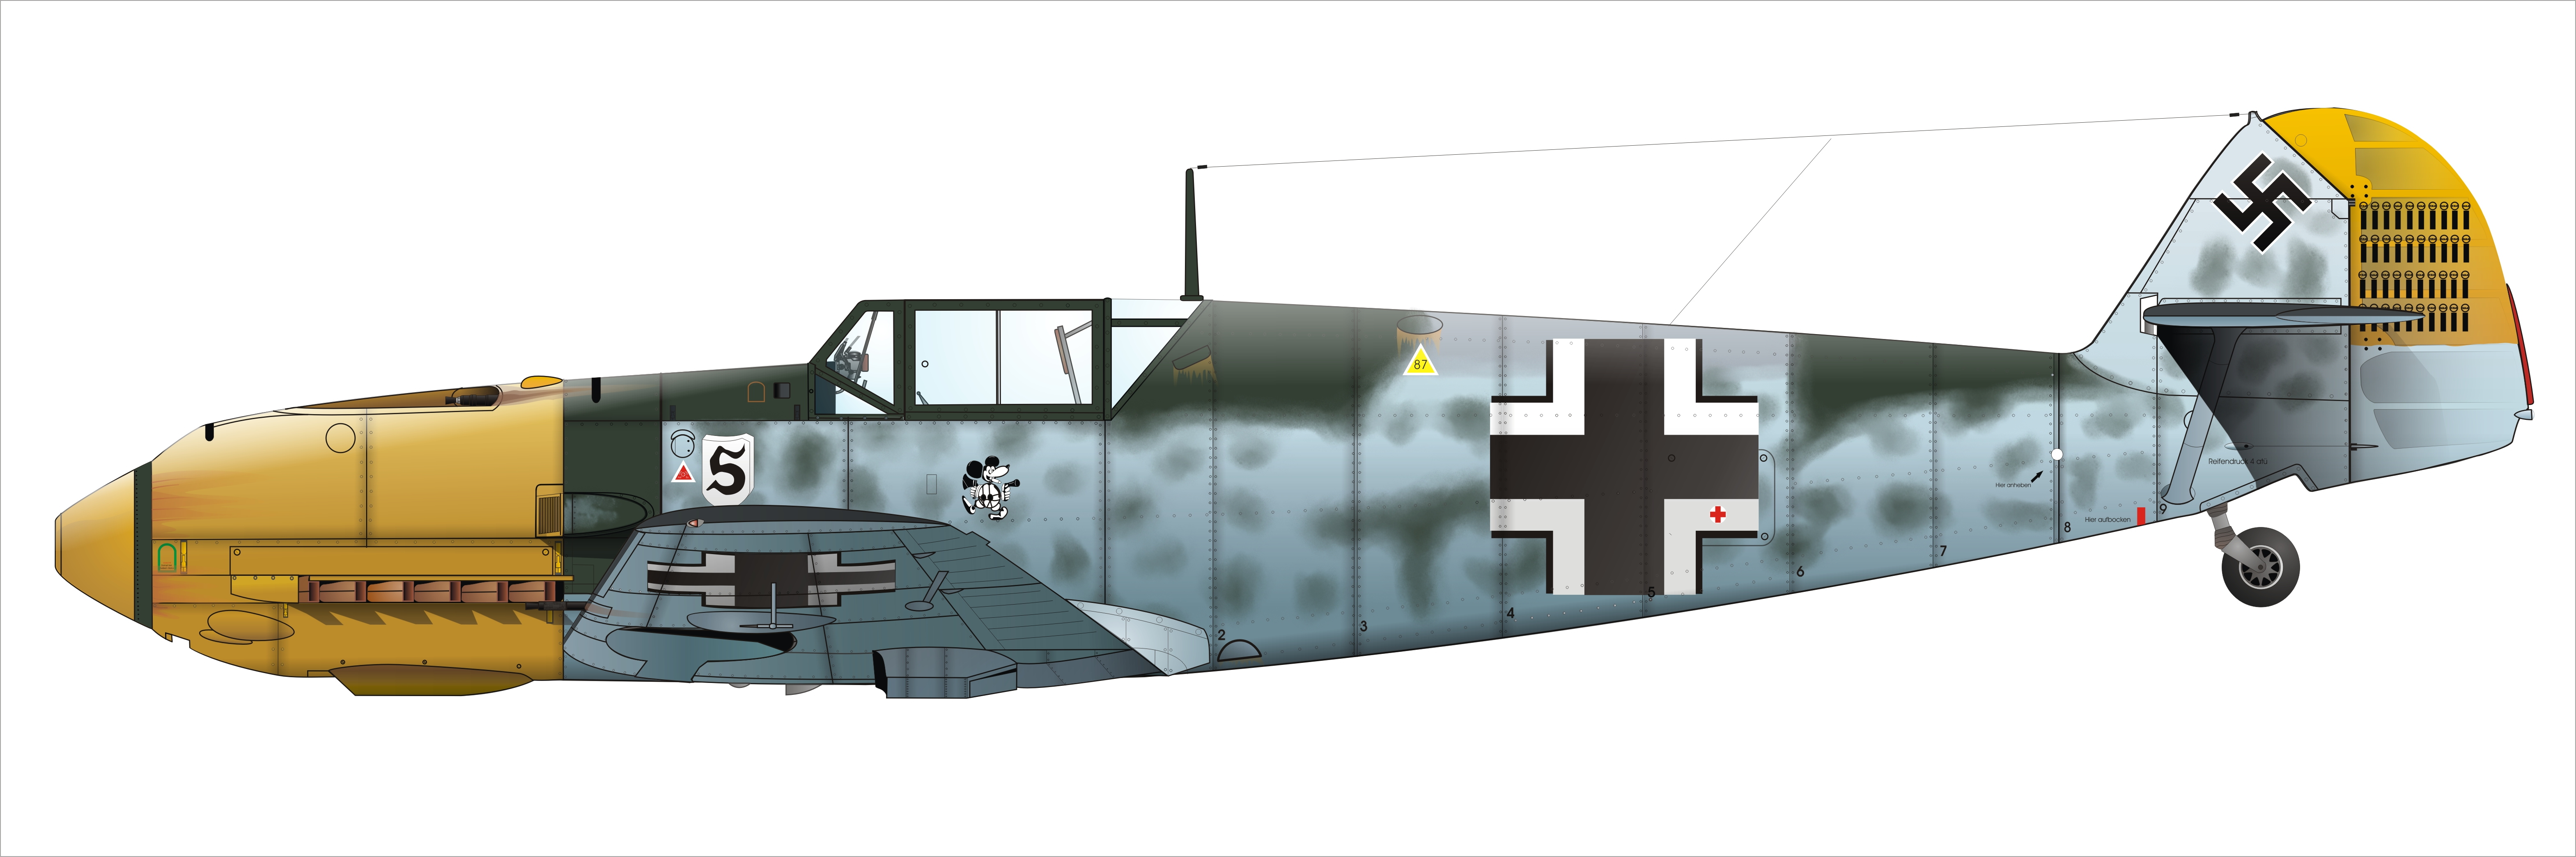 Bf109_Galland_Gerippe.jpg